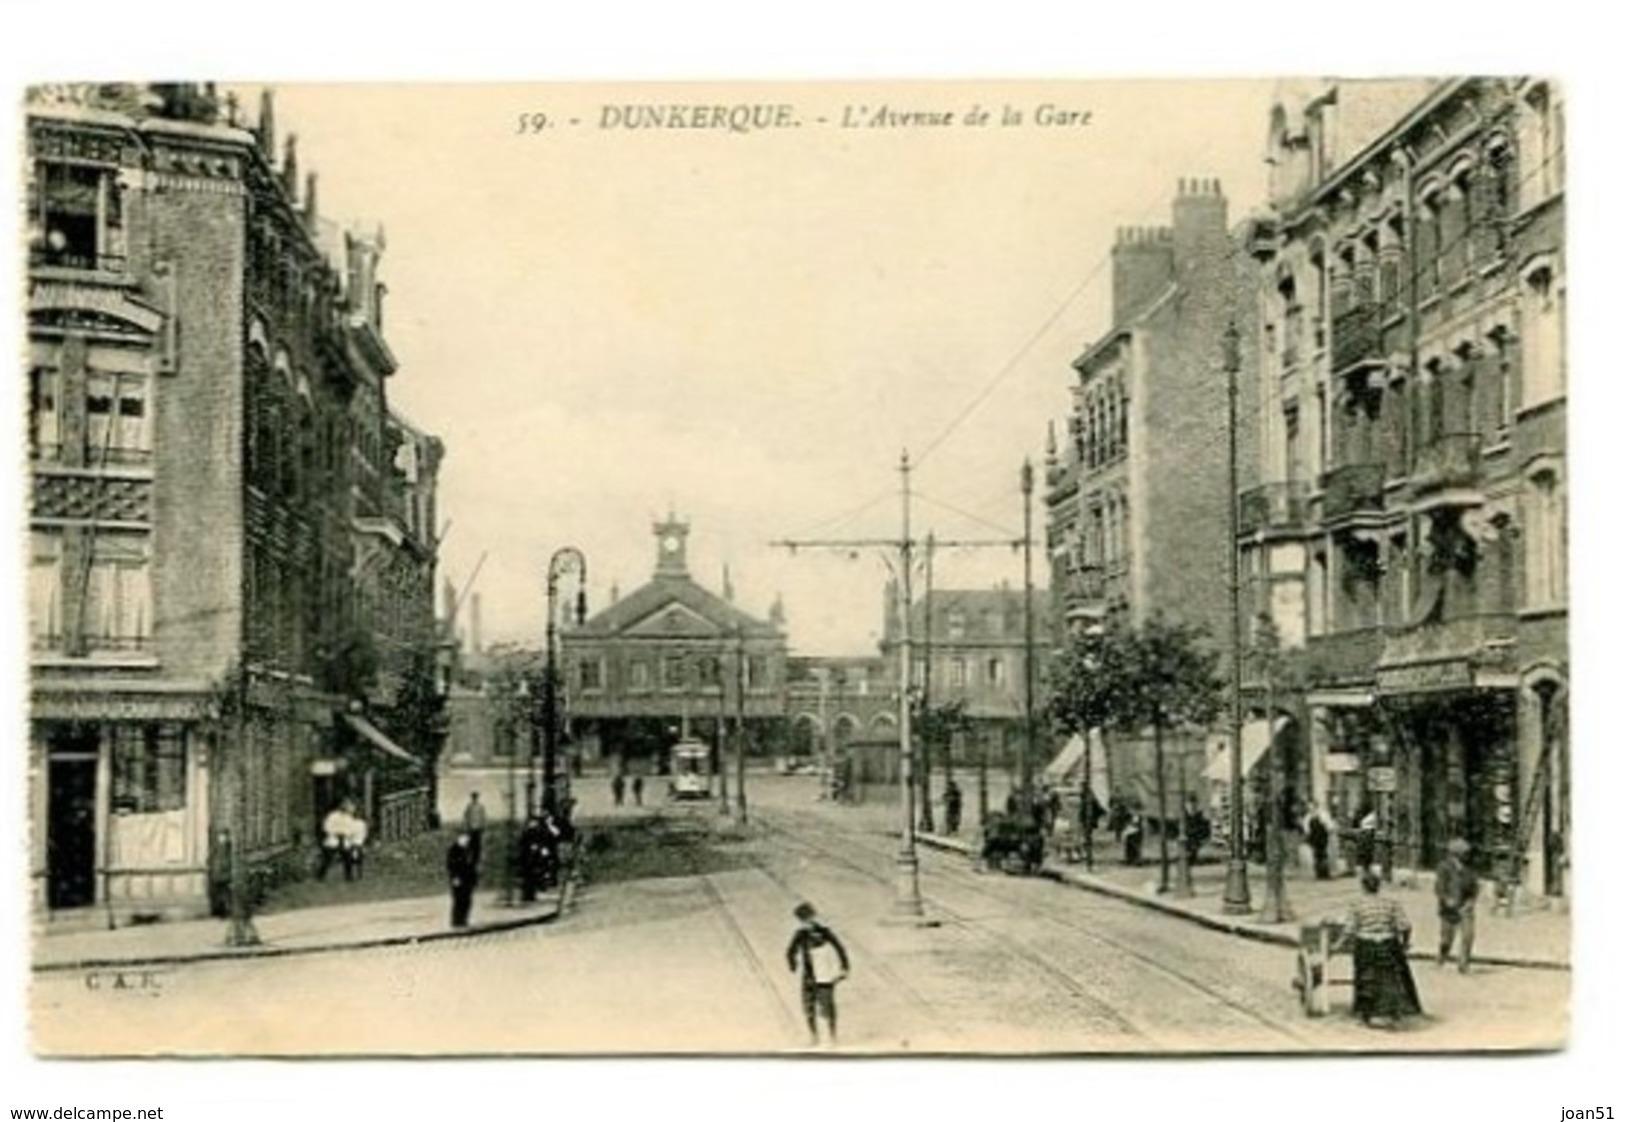 C27  DUNKERQUE L'AVENUE DE LA GARE 1919 - Dunkerque